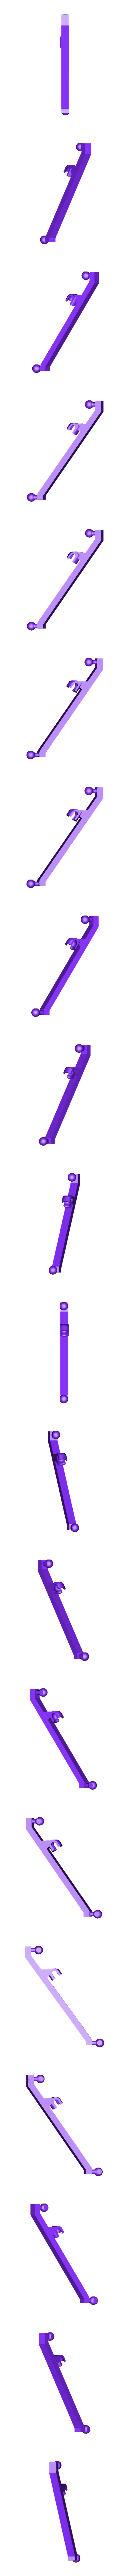 pitch_arm.stl Download free STL file Joystick PS4 • 3D print object, Osichan